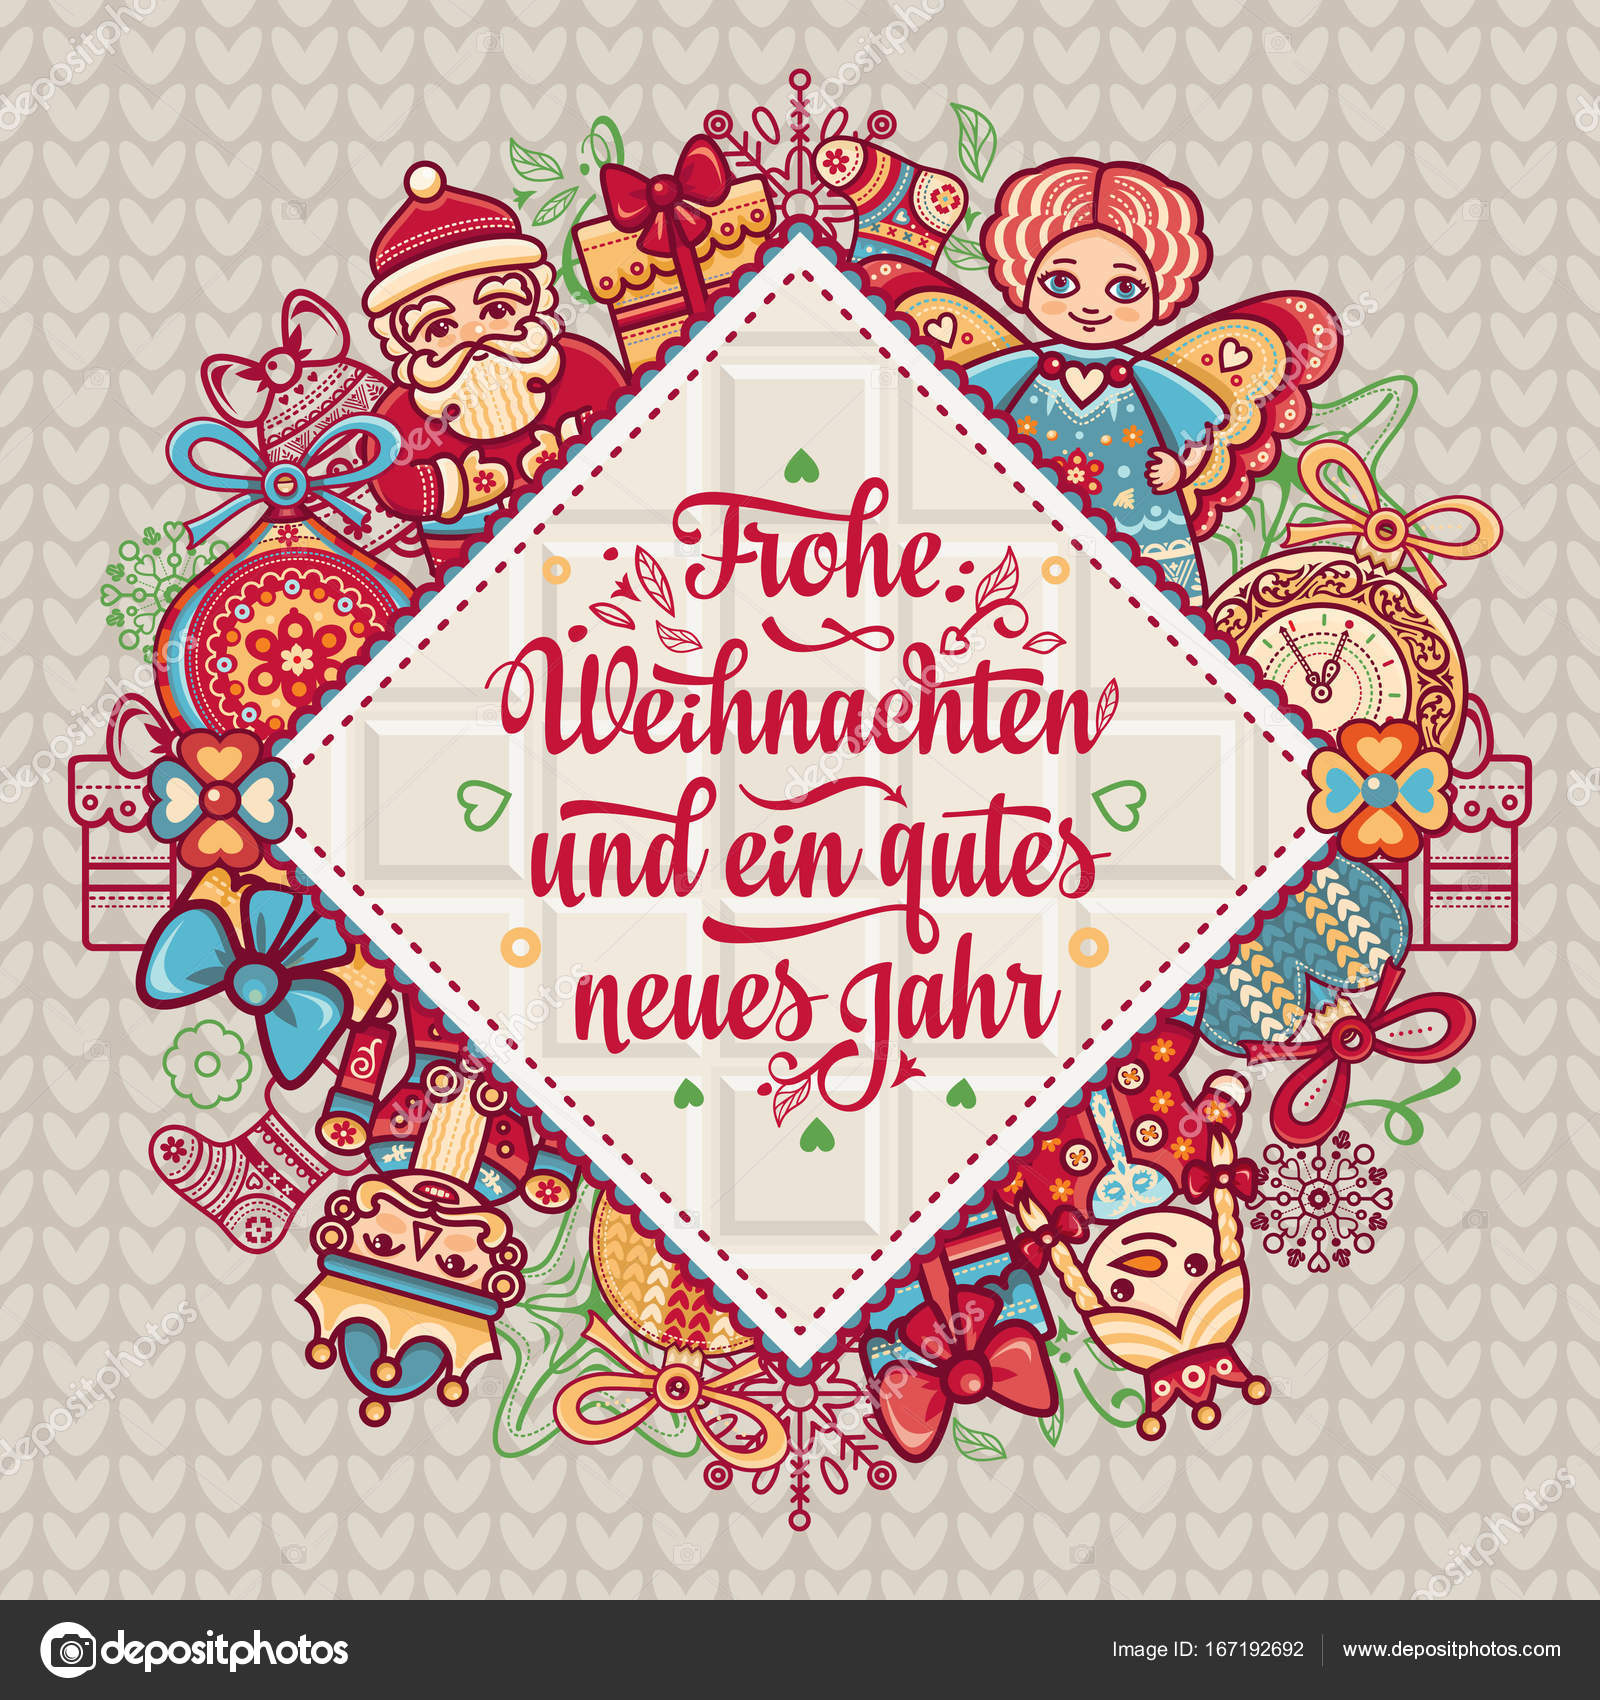 Frohe Weihnachten Schweiz.Frohe Weihnacht Xmas Congratulations In Germany Stockvektor Zzn